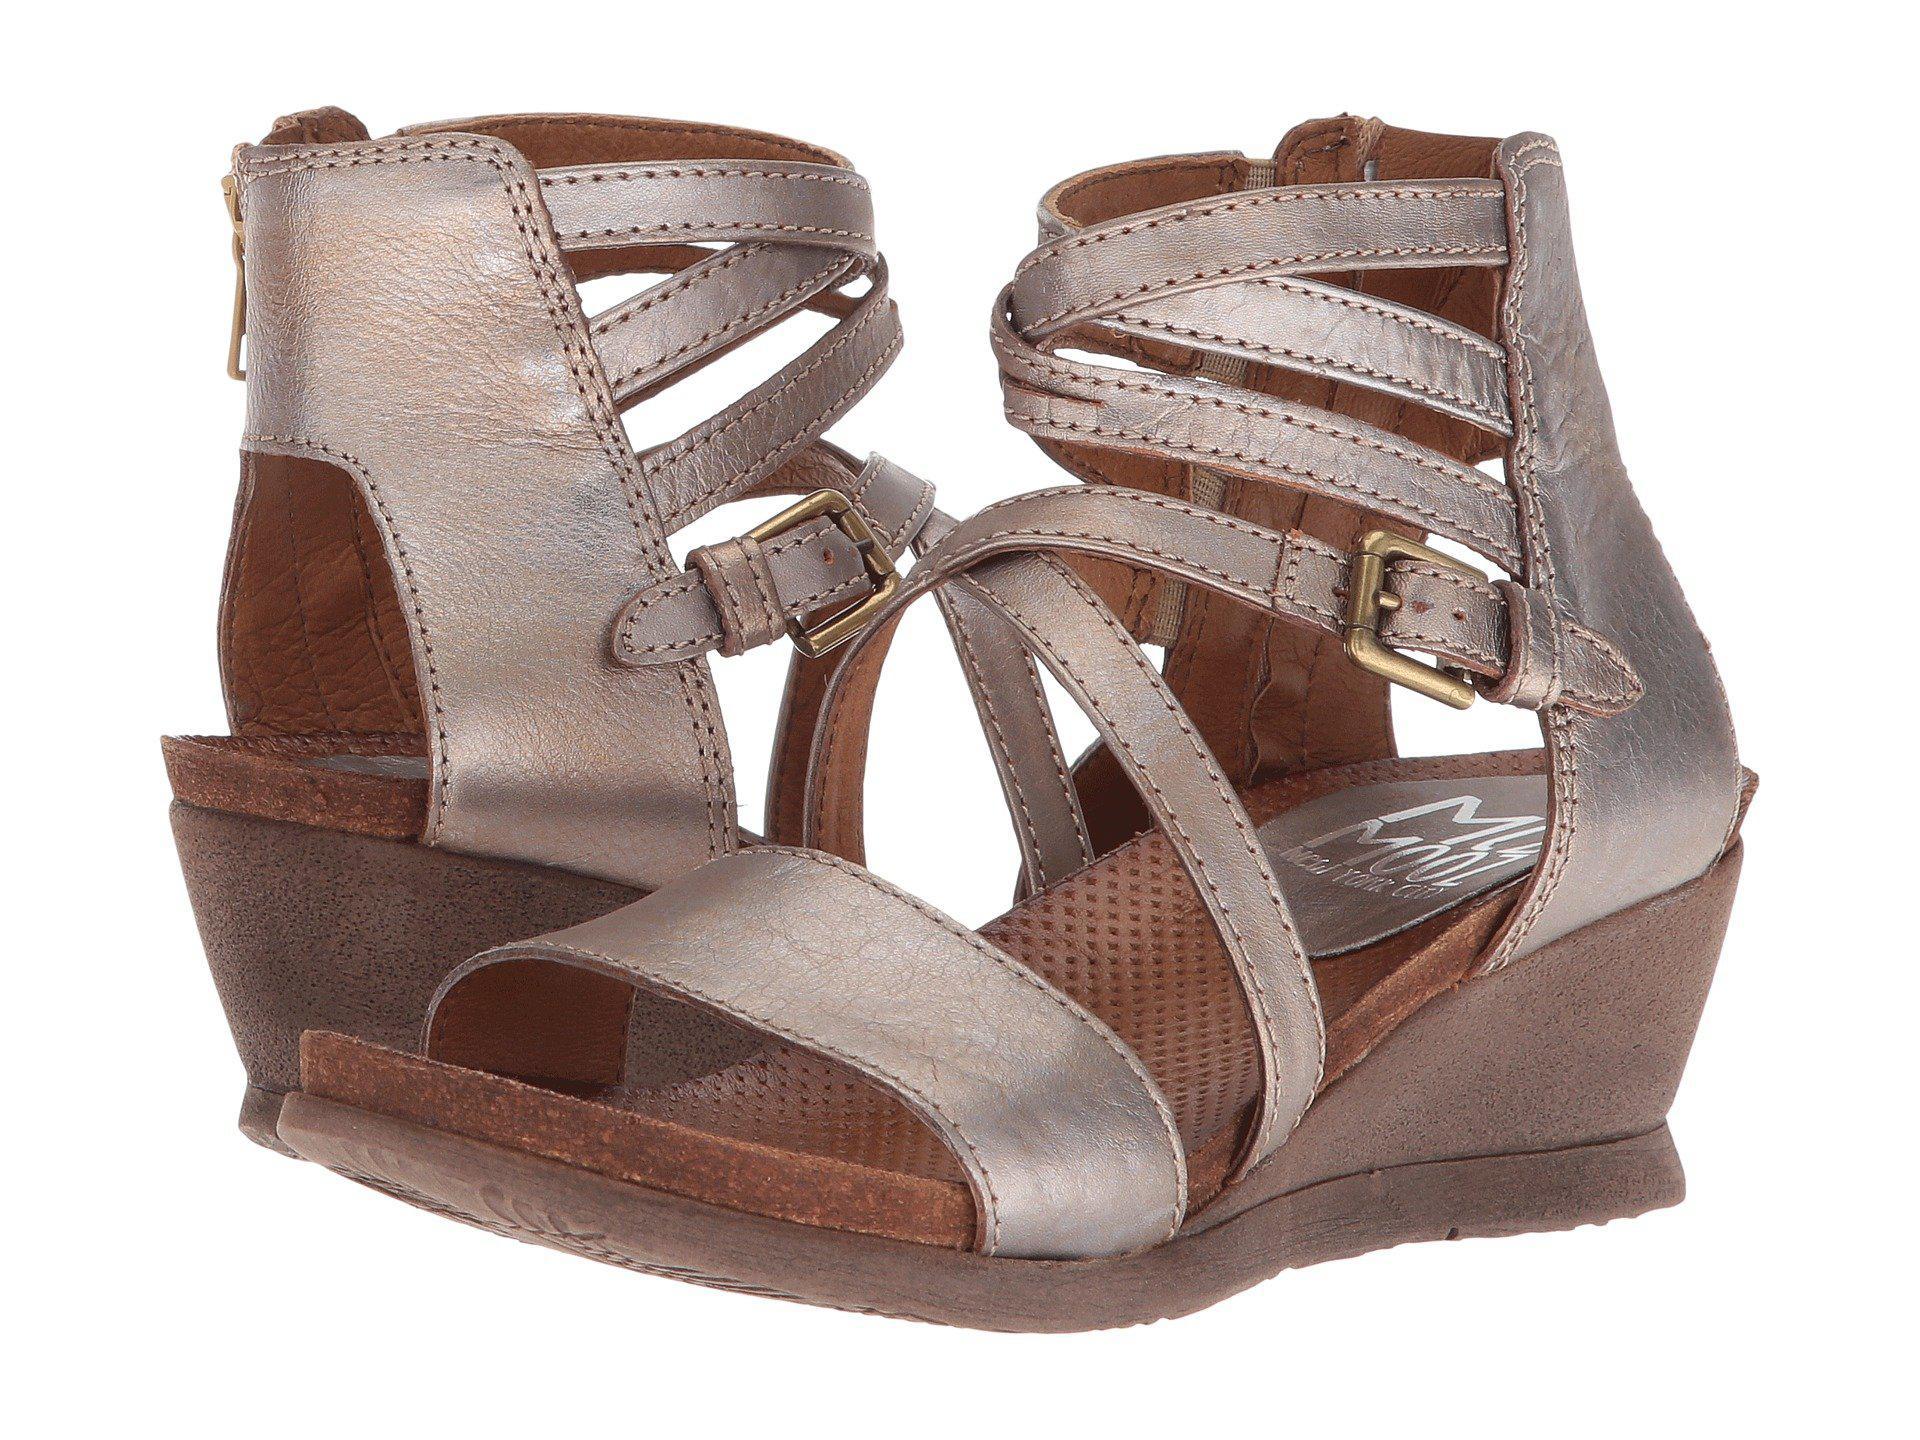 65aee6f953d4 Lyst - Miz Mooz Shay (pebble) Women s Wedge Shoes in Brown